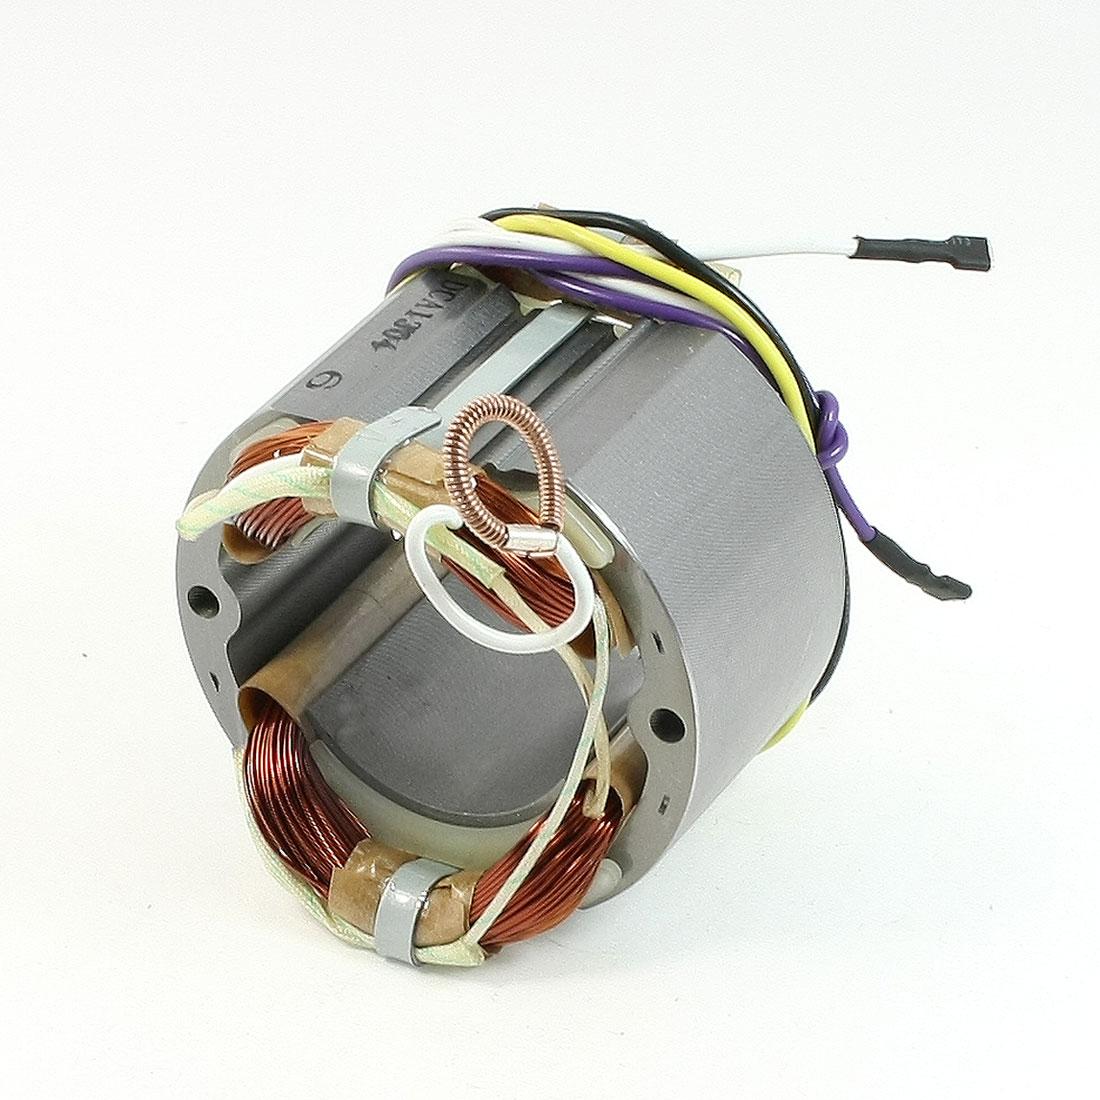 AC220V 55.1mm Core Power Part Motor Stator for Makita LS1040 Aluminum Cutter Machine